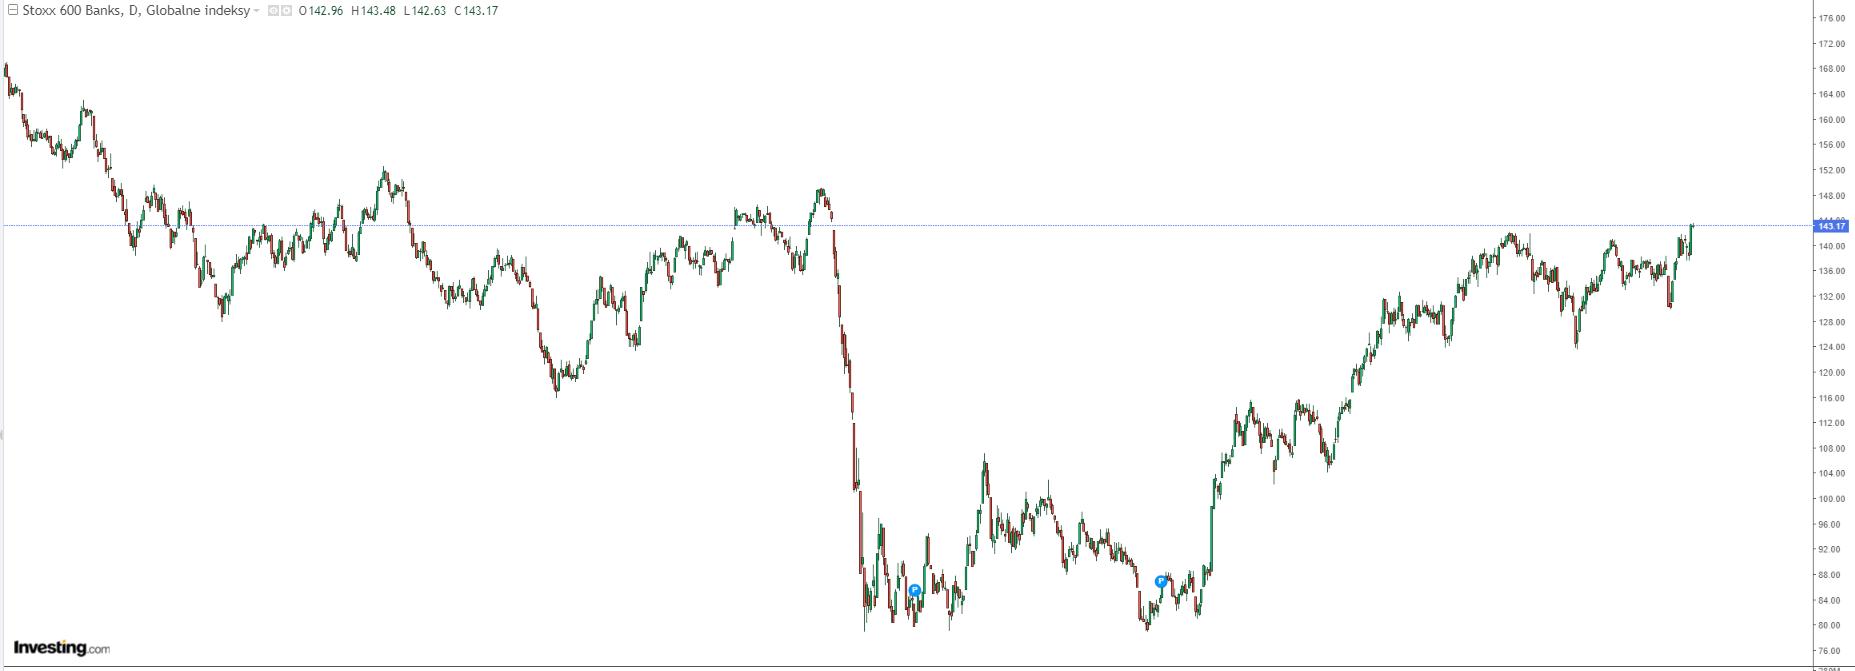 wykres Kurs STOXX Europe 600 D1 06.10.2021